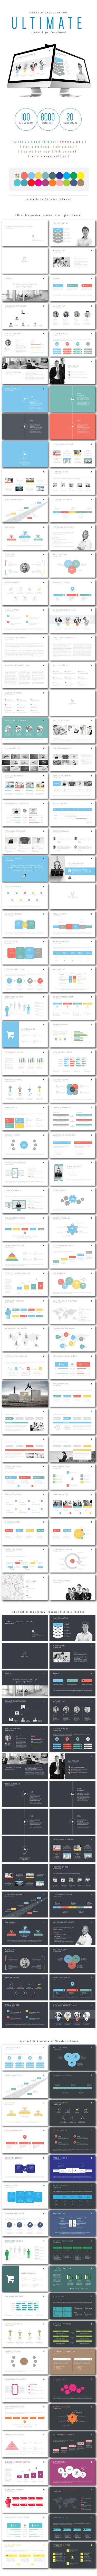 Powerpoint / Keynote Presentation Template on Behance